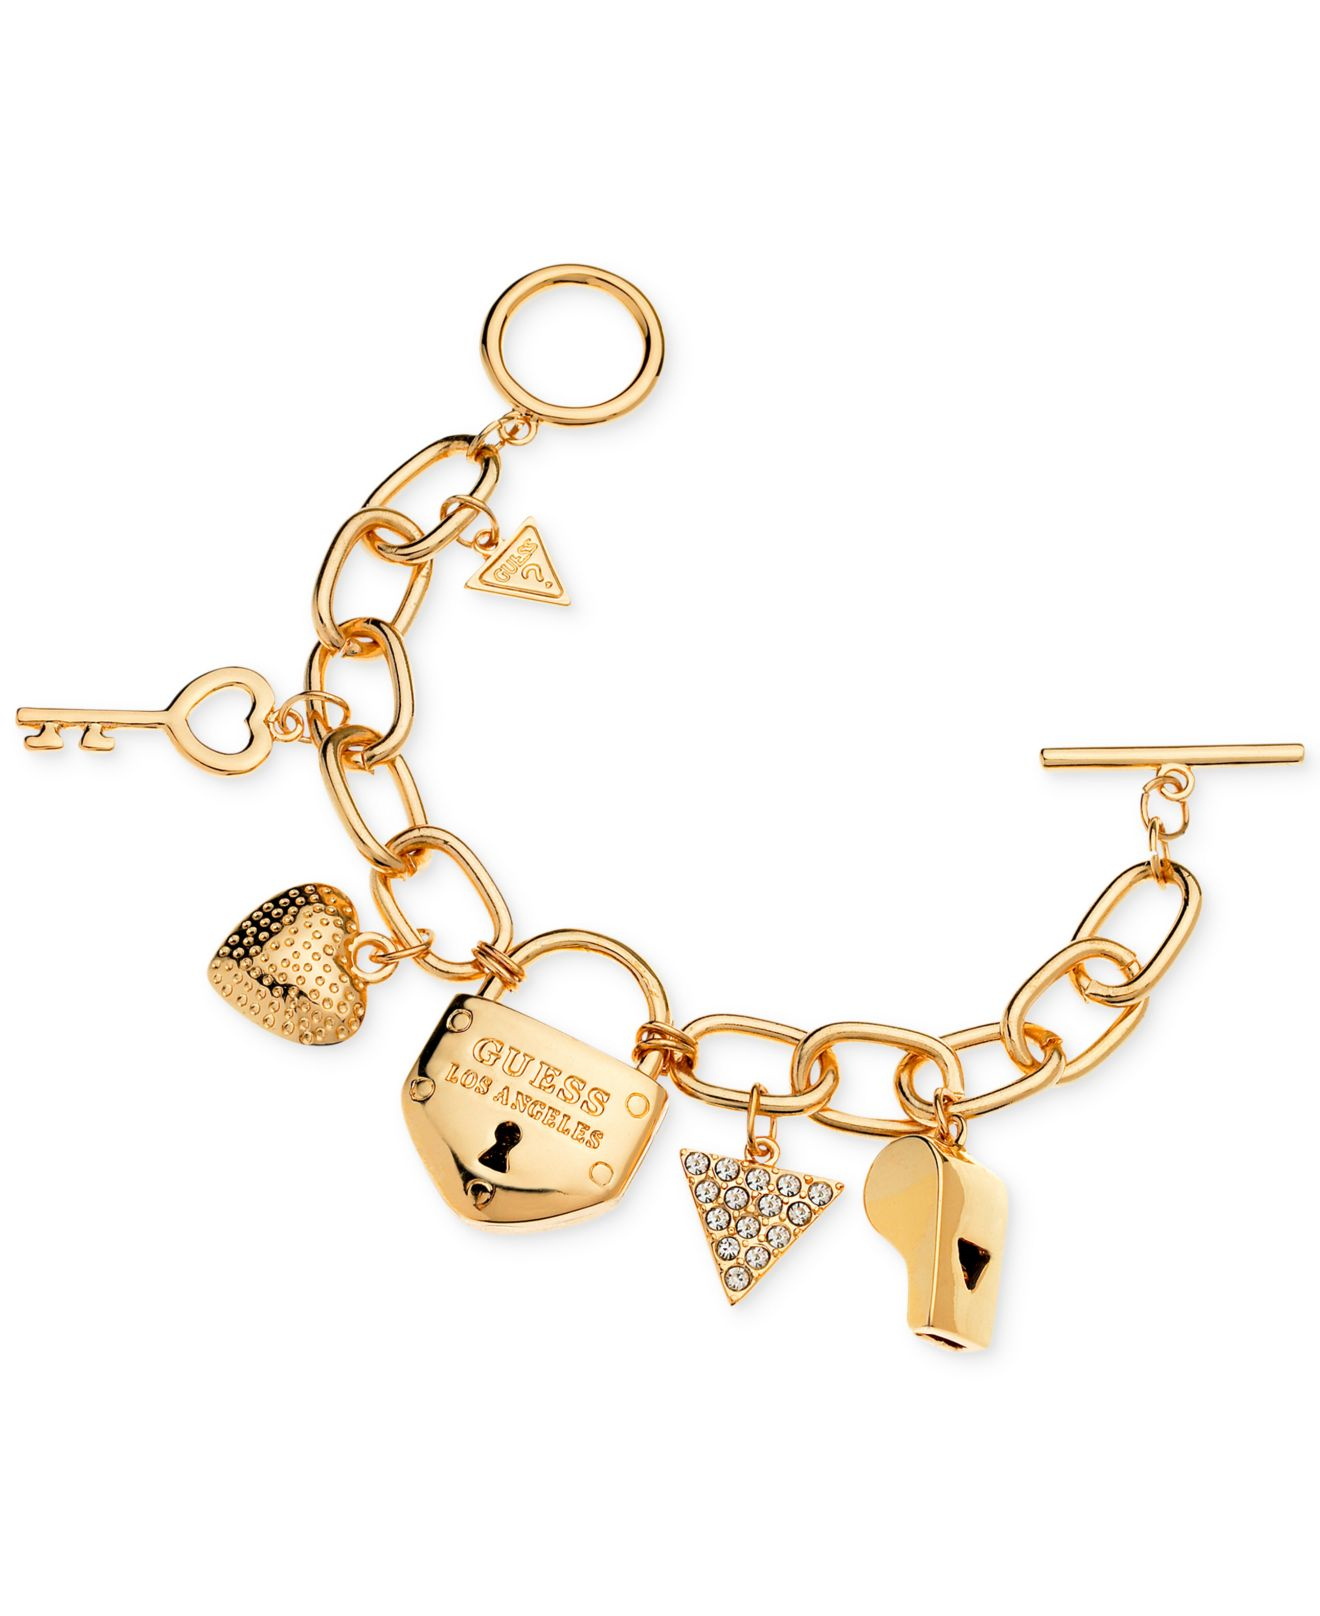 Guess Gold tone Charm Bracelet in Metallic